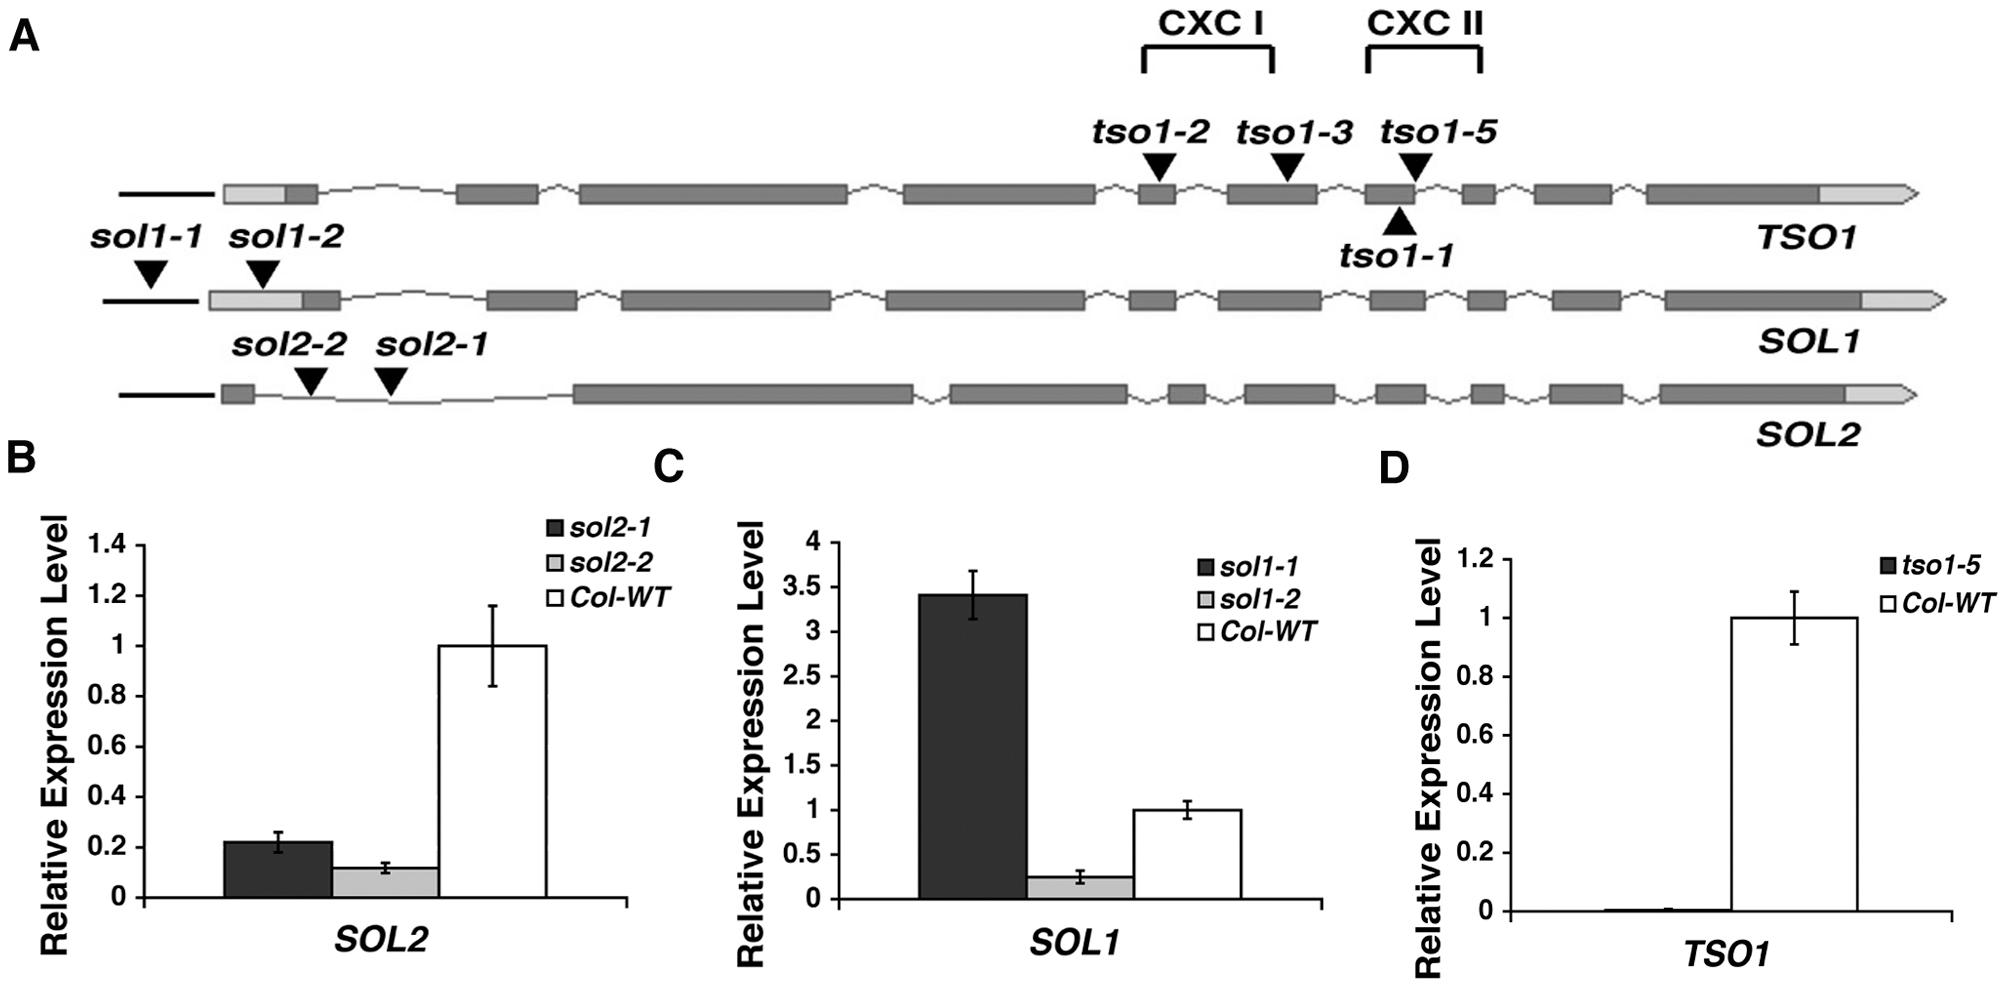 Analyses of T-DNA insertion lines in <i>TSO1</i>, <i>SOL1</i>, and <i>SOL2</i>.